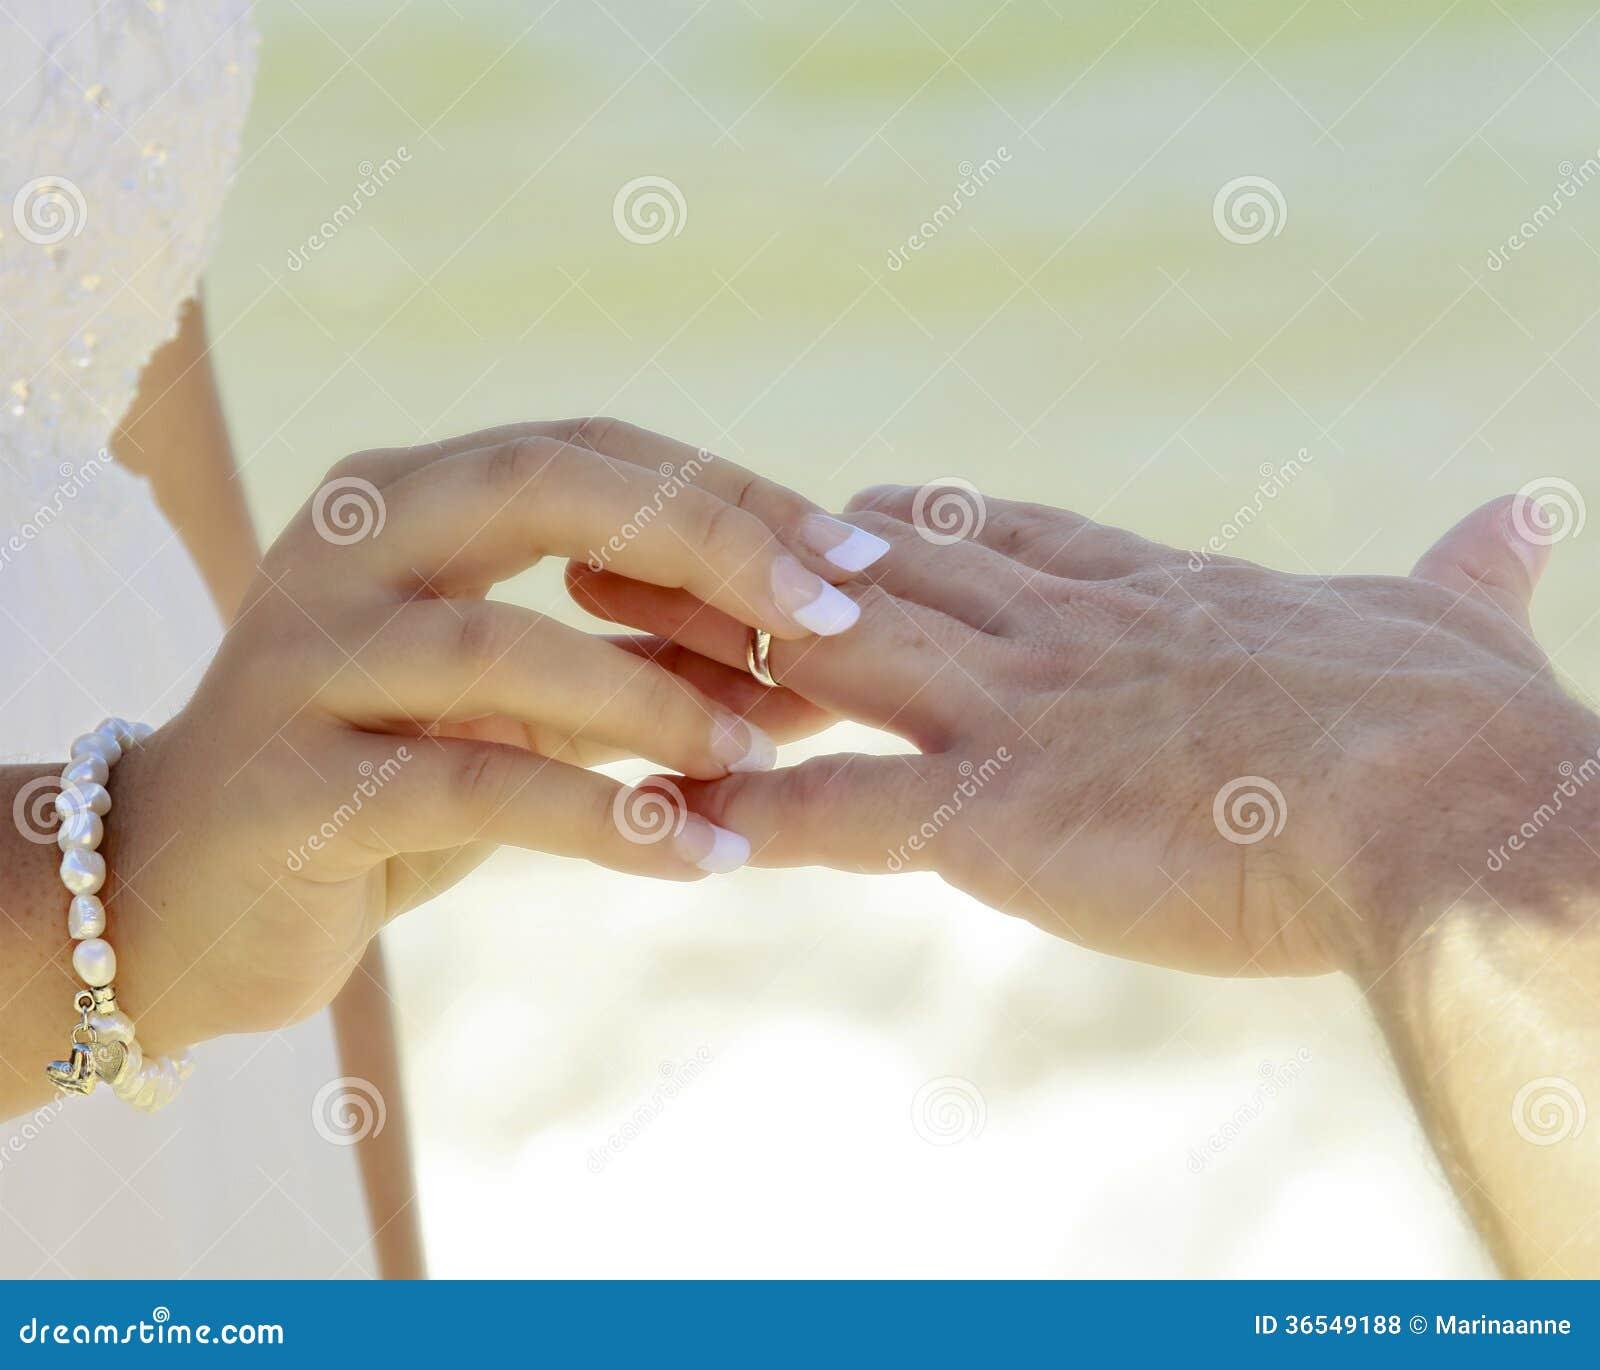 Wedding Ring Royalty Free Stock Photos Image 36549188